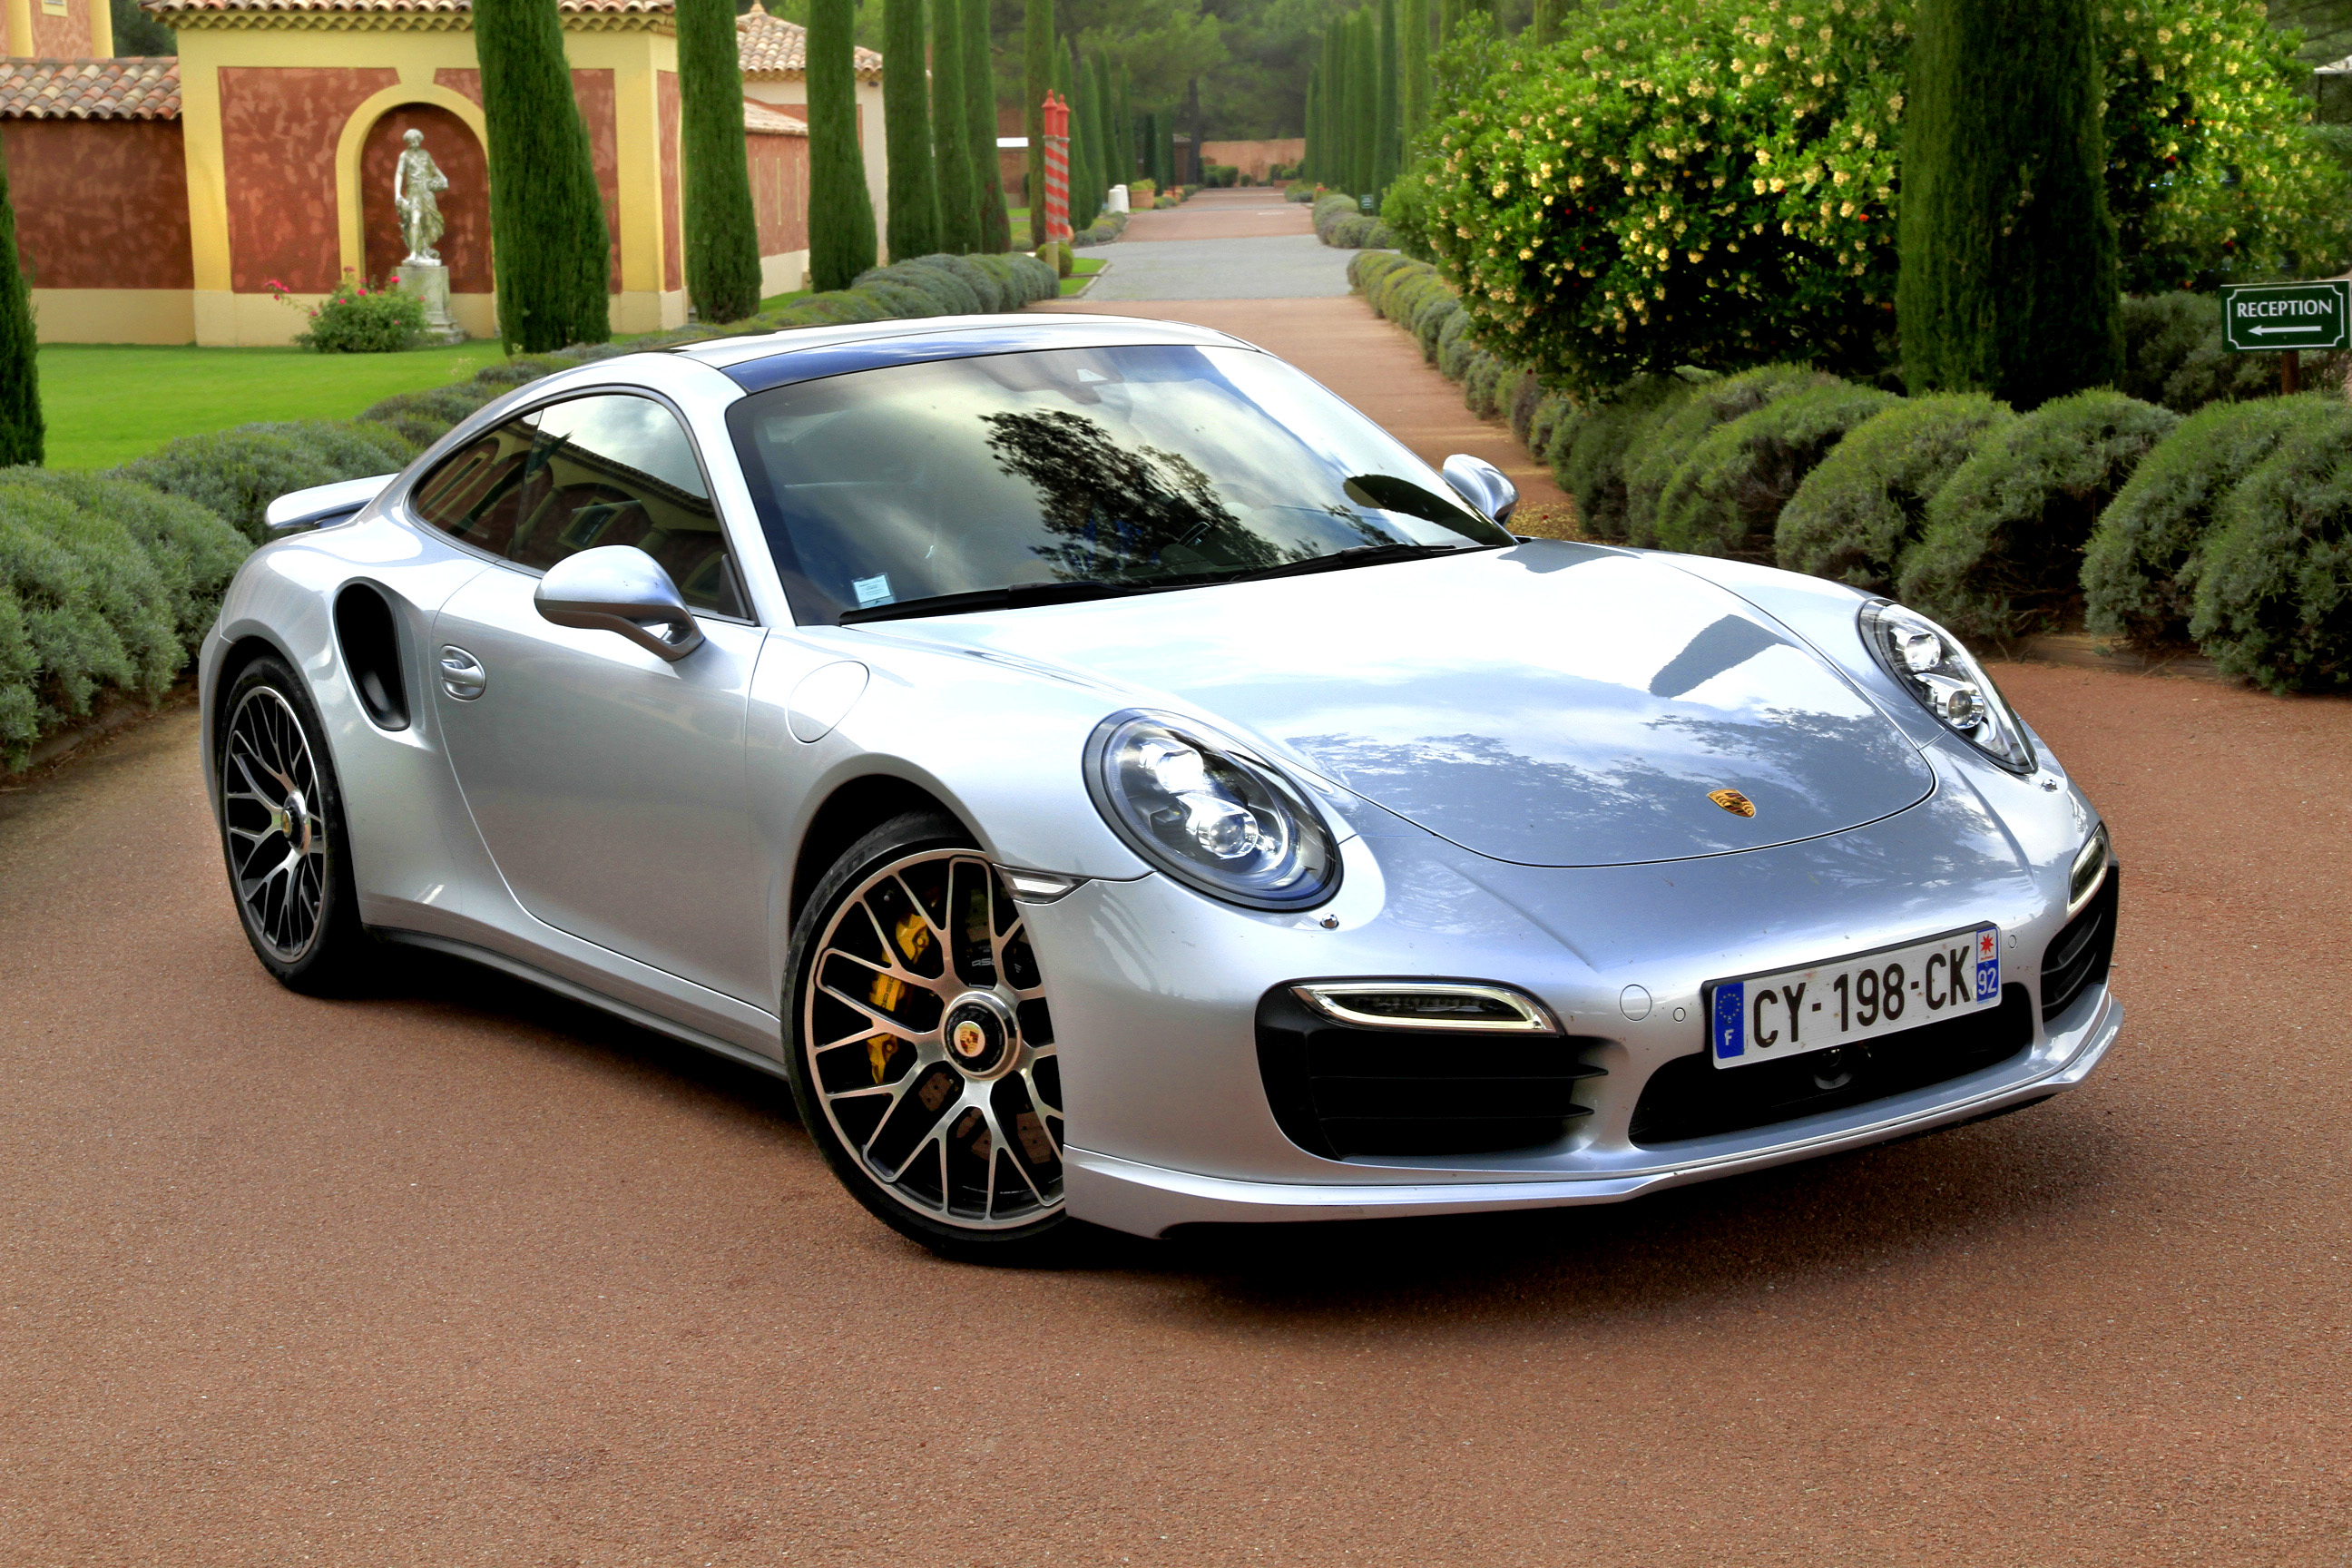 http://images.caradisiac.com/images/0/1/5/6/90156/S0-Essai-video-Porsche-911-Turbo-S-la-bete-domestiquee-306365.jpg